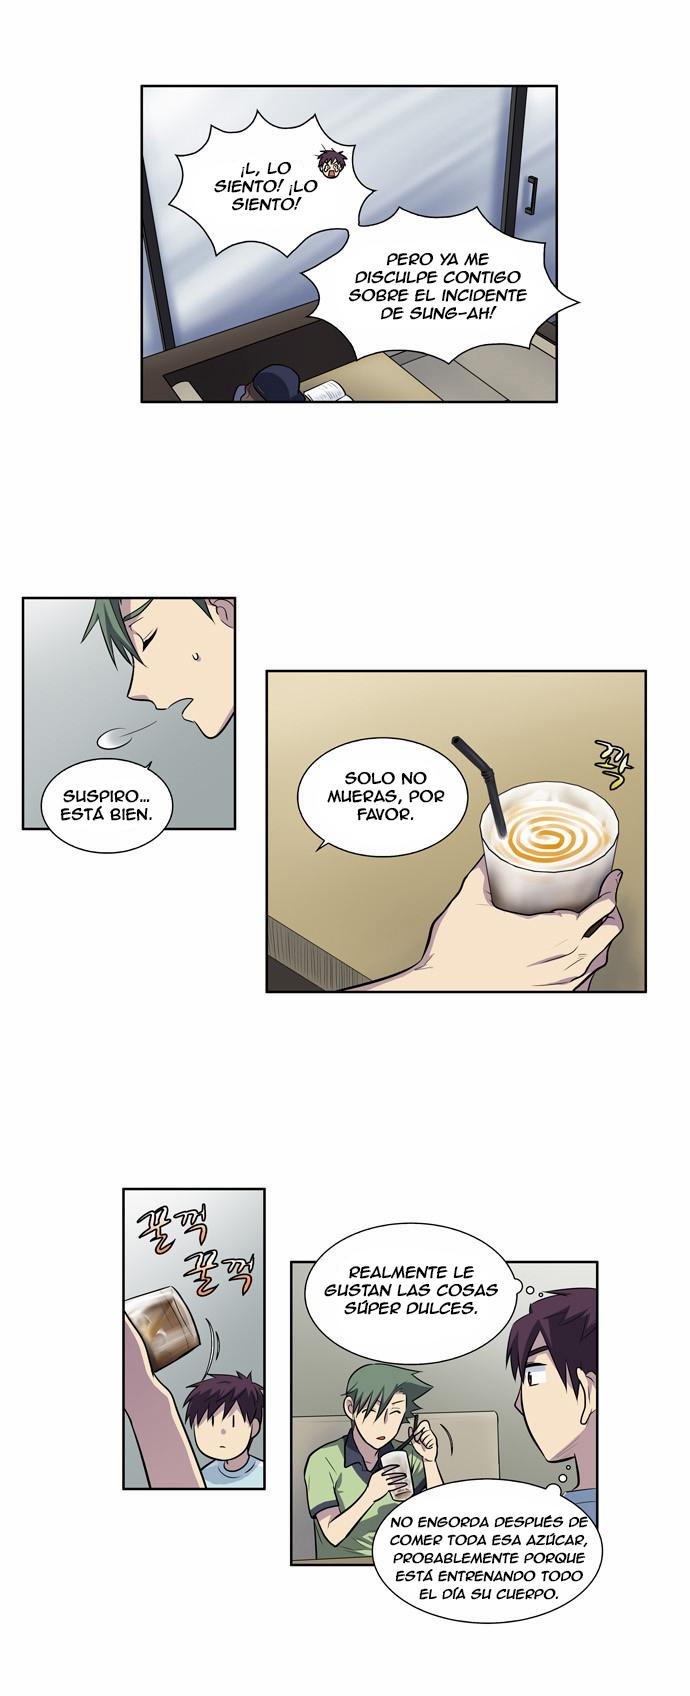 http://c5.ninemanga.com/es_manga/61/1725/416523/042685d154c9fb522bd724d4aba95ab3.jpg Page 19